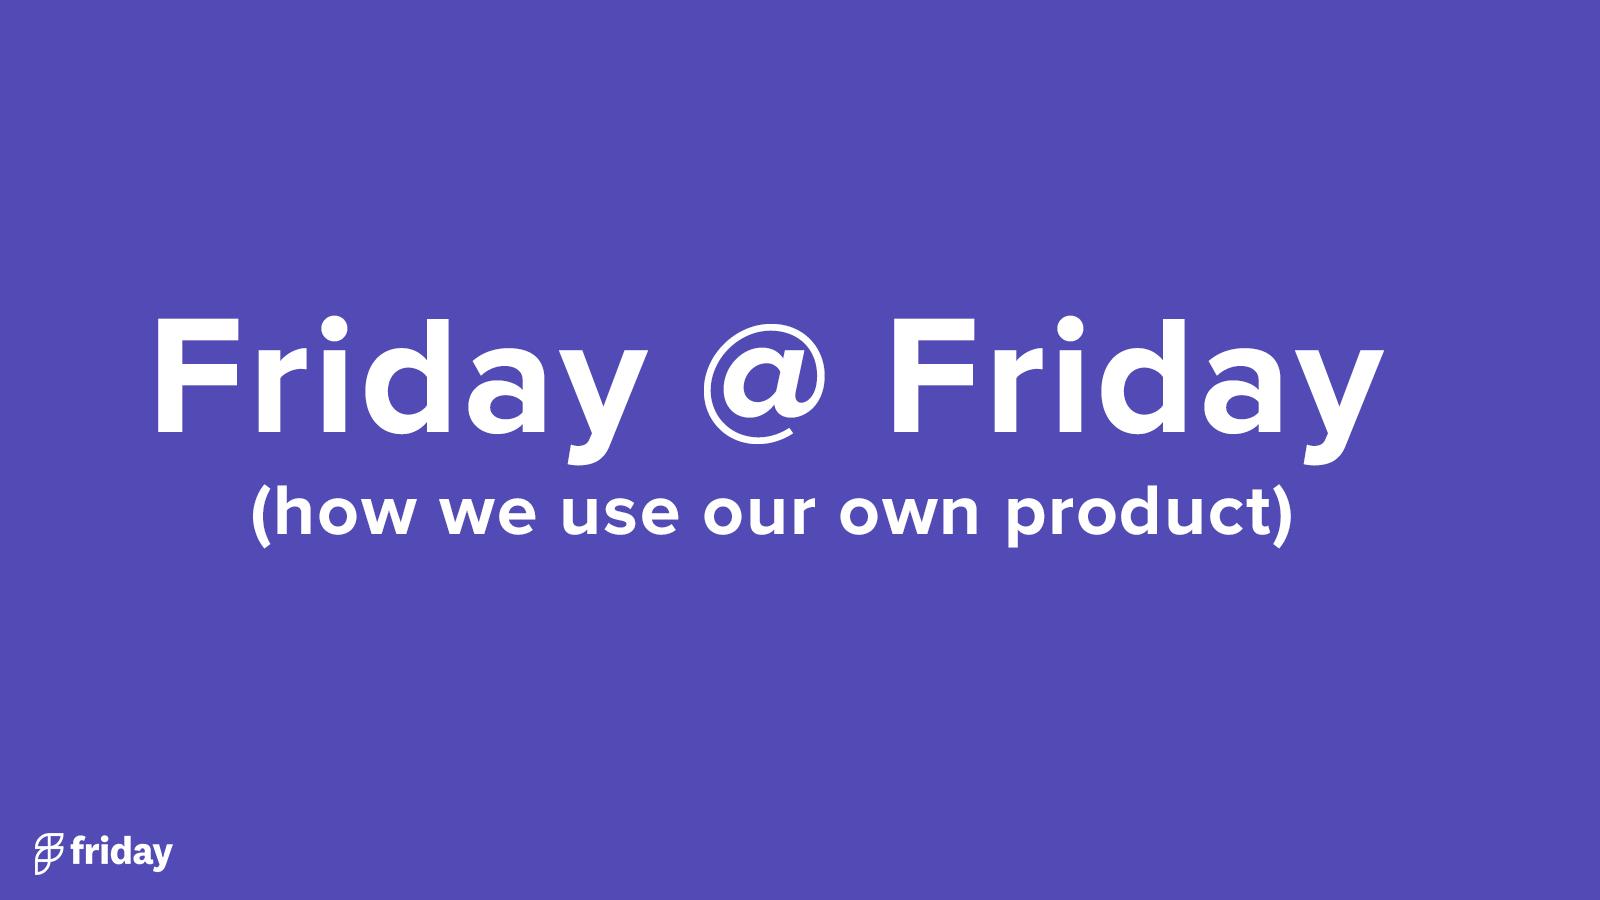 Friday @ Friday